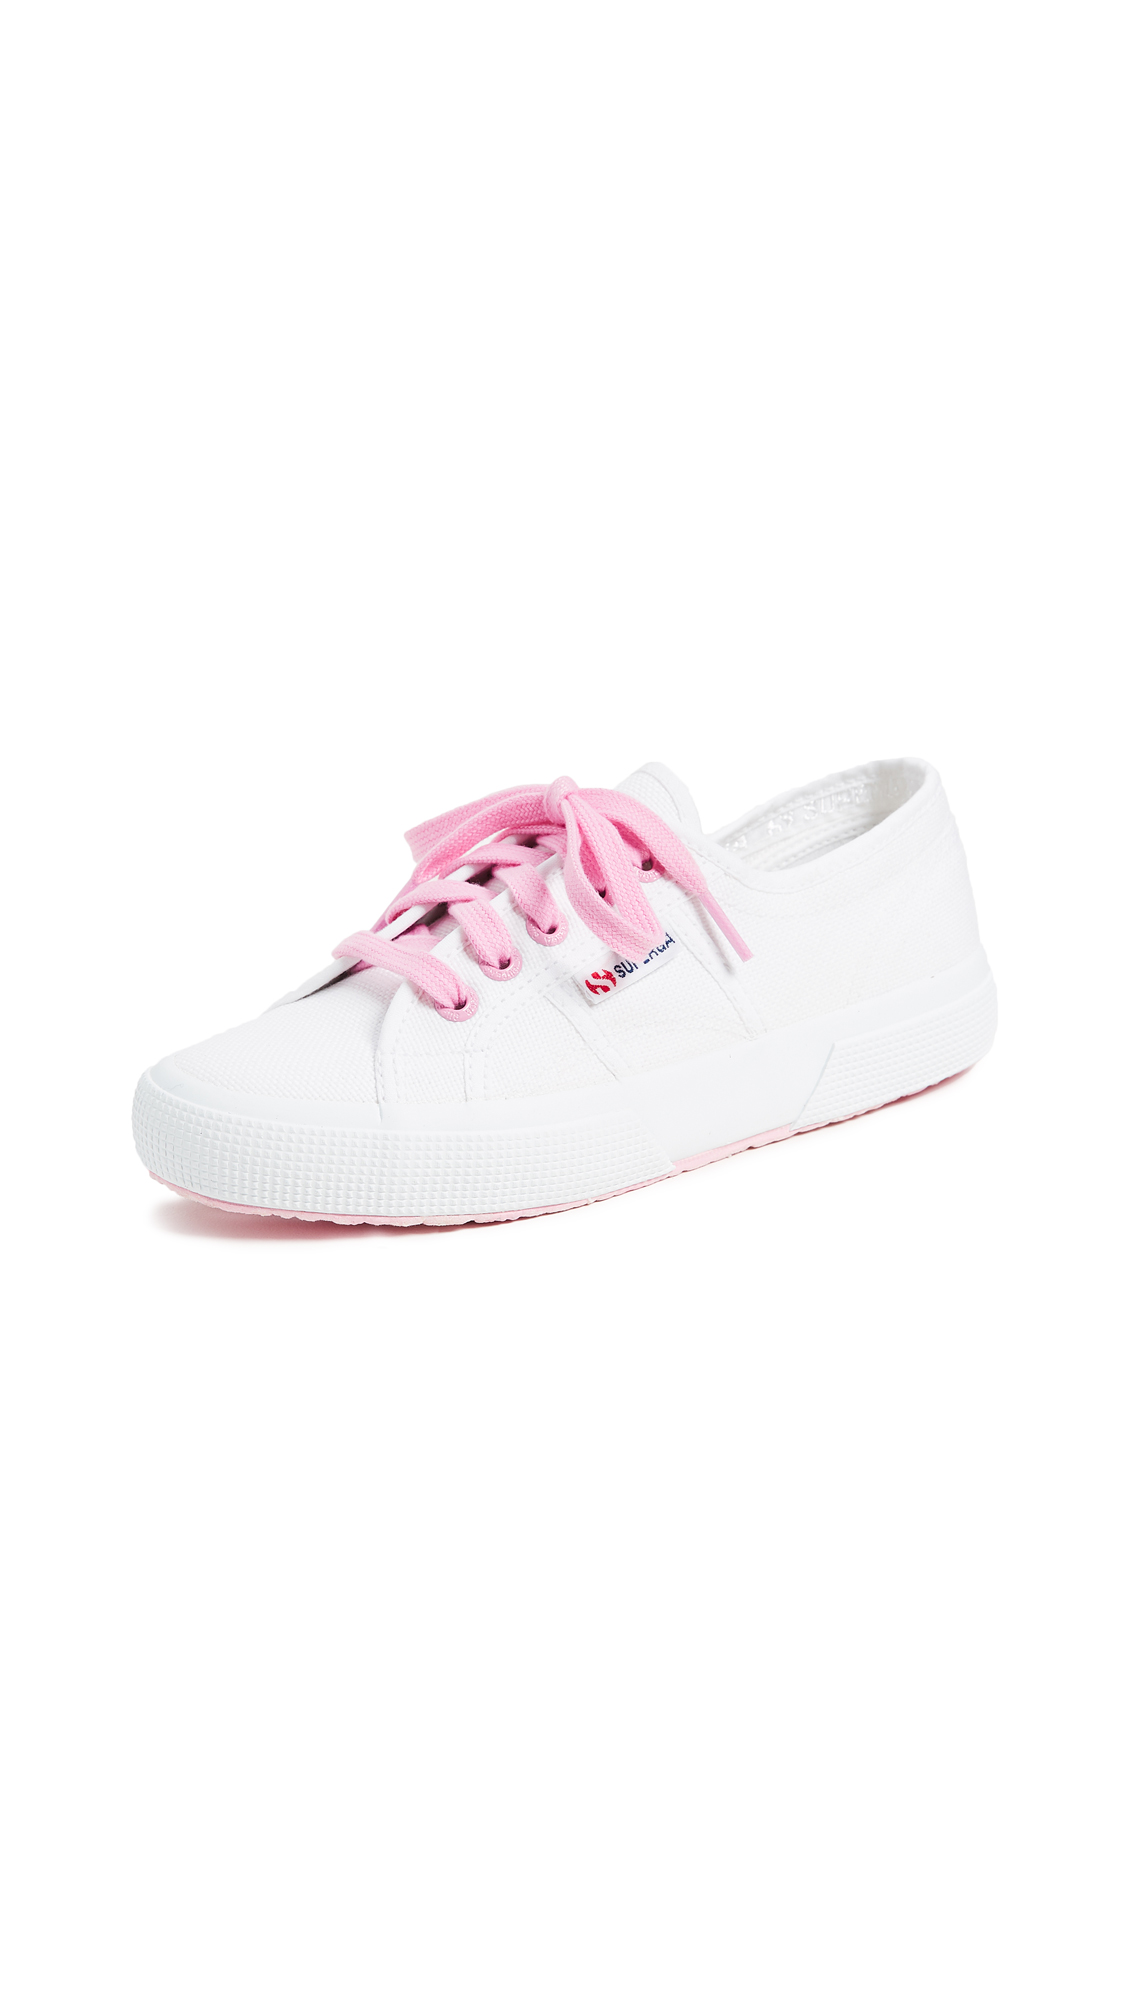 Superga 2750 Cotu Classic Sneakers - Pink Multi